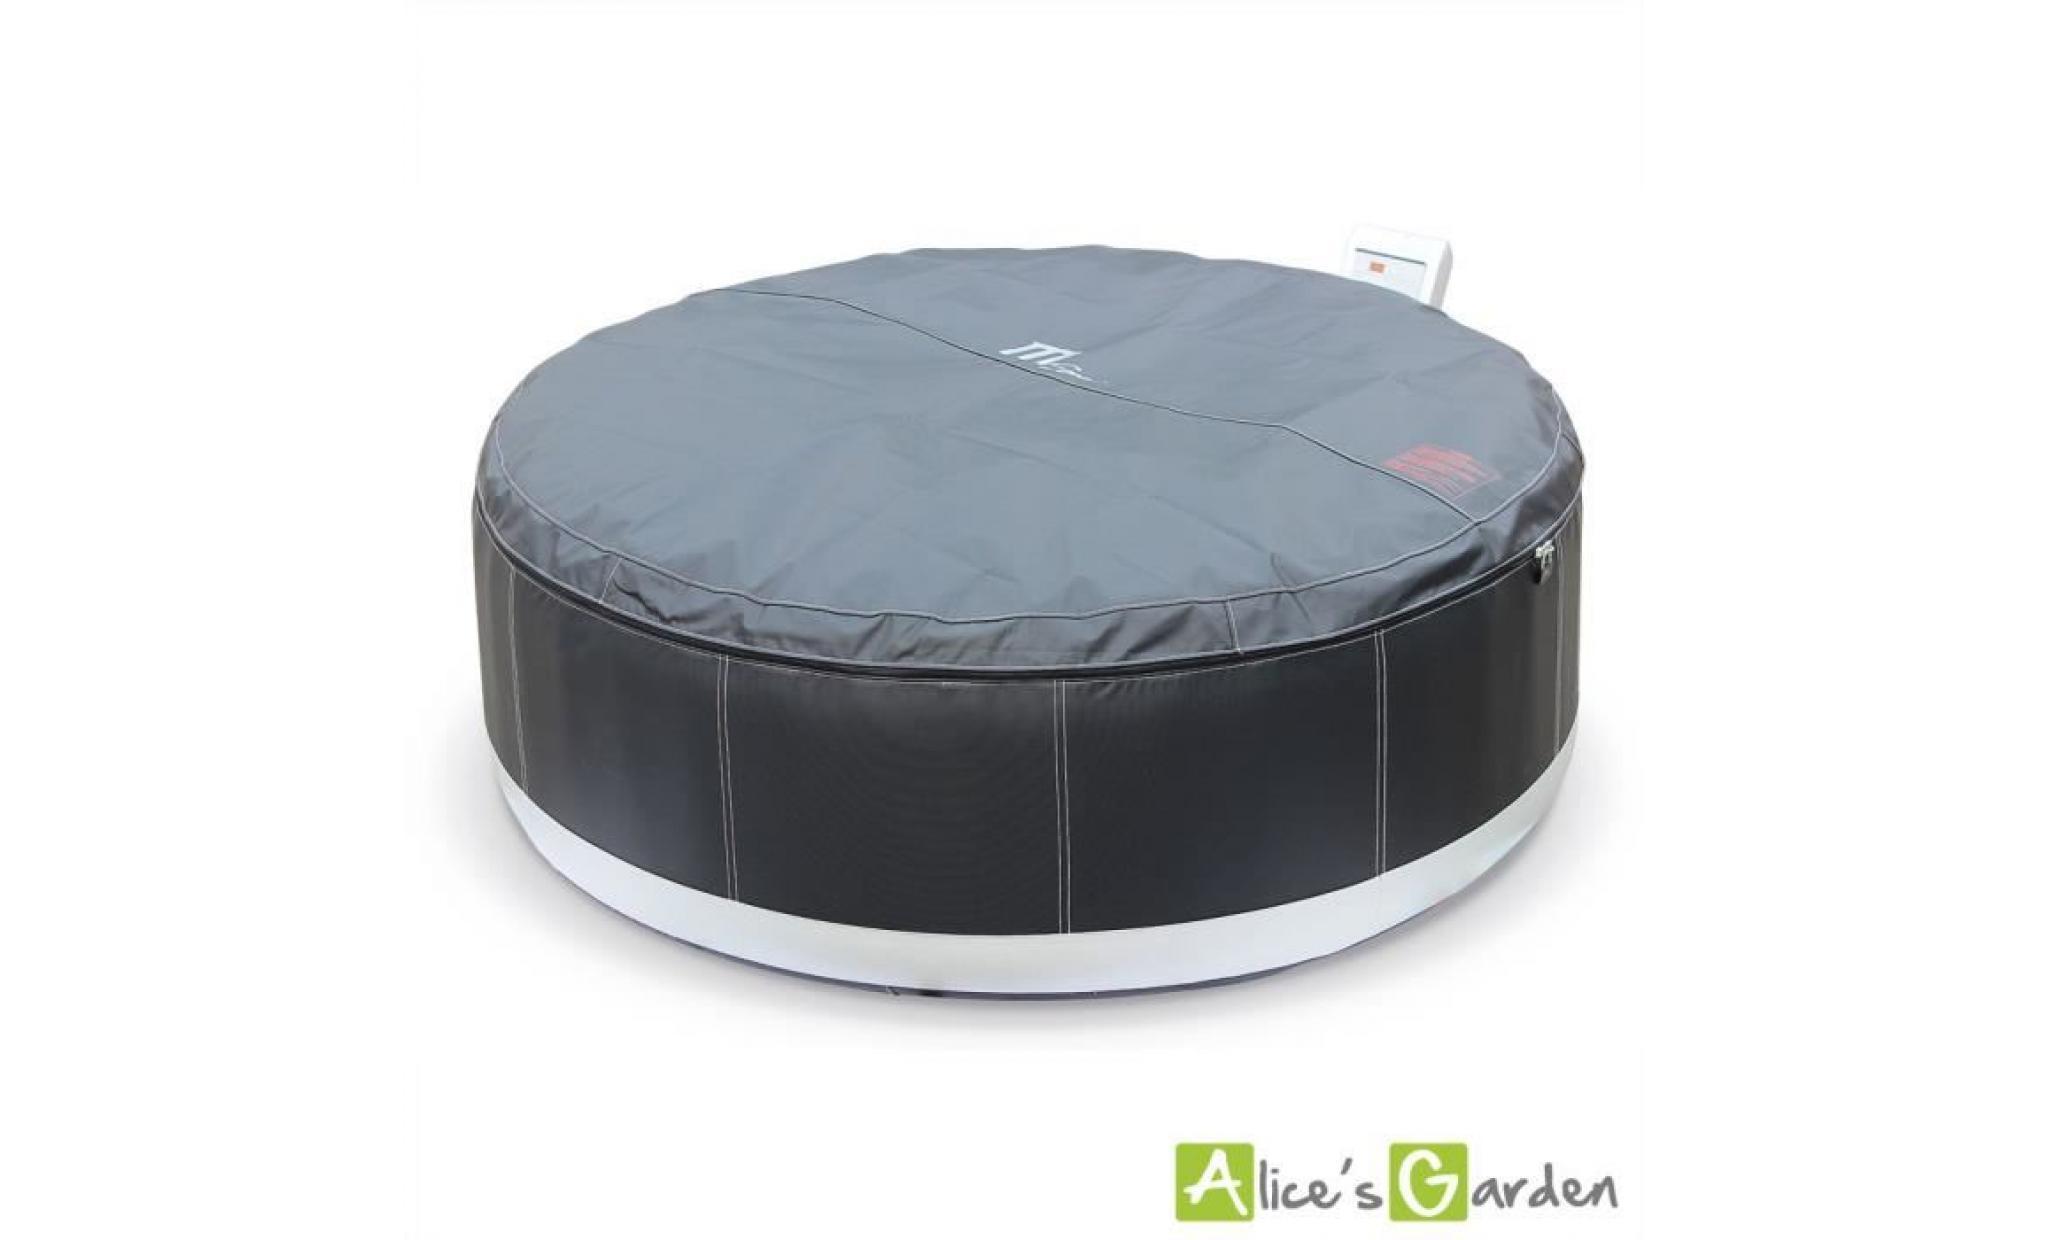 Spa gonflable ottawa xxl cuir noir 6 personnes 205cm jacuzzi pu luxe avec - Spa gonflable 2 personnes pas cher ...